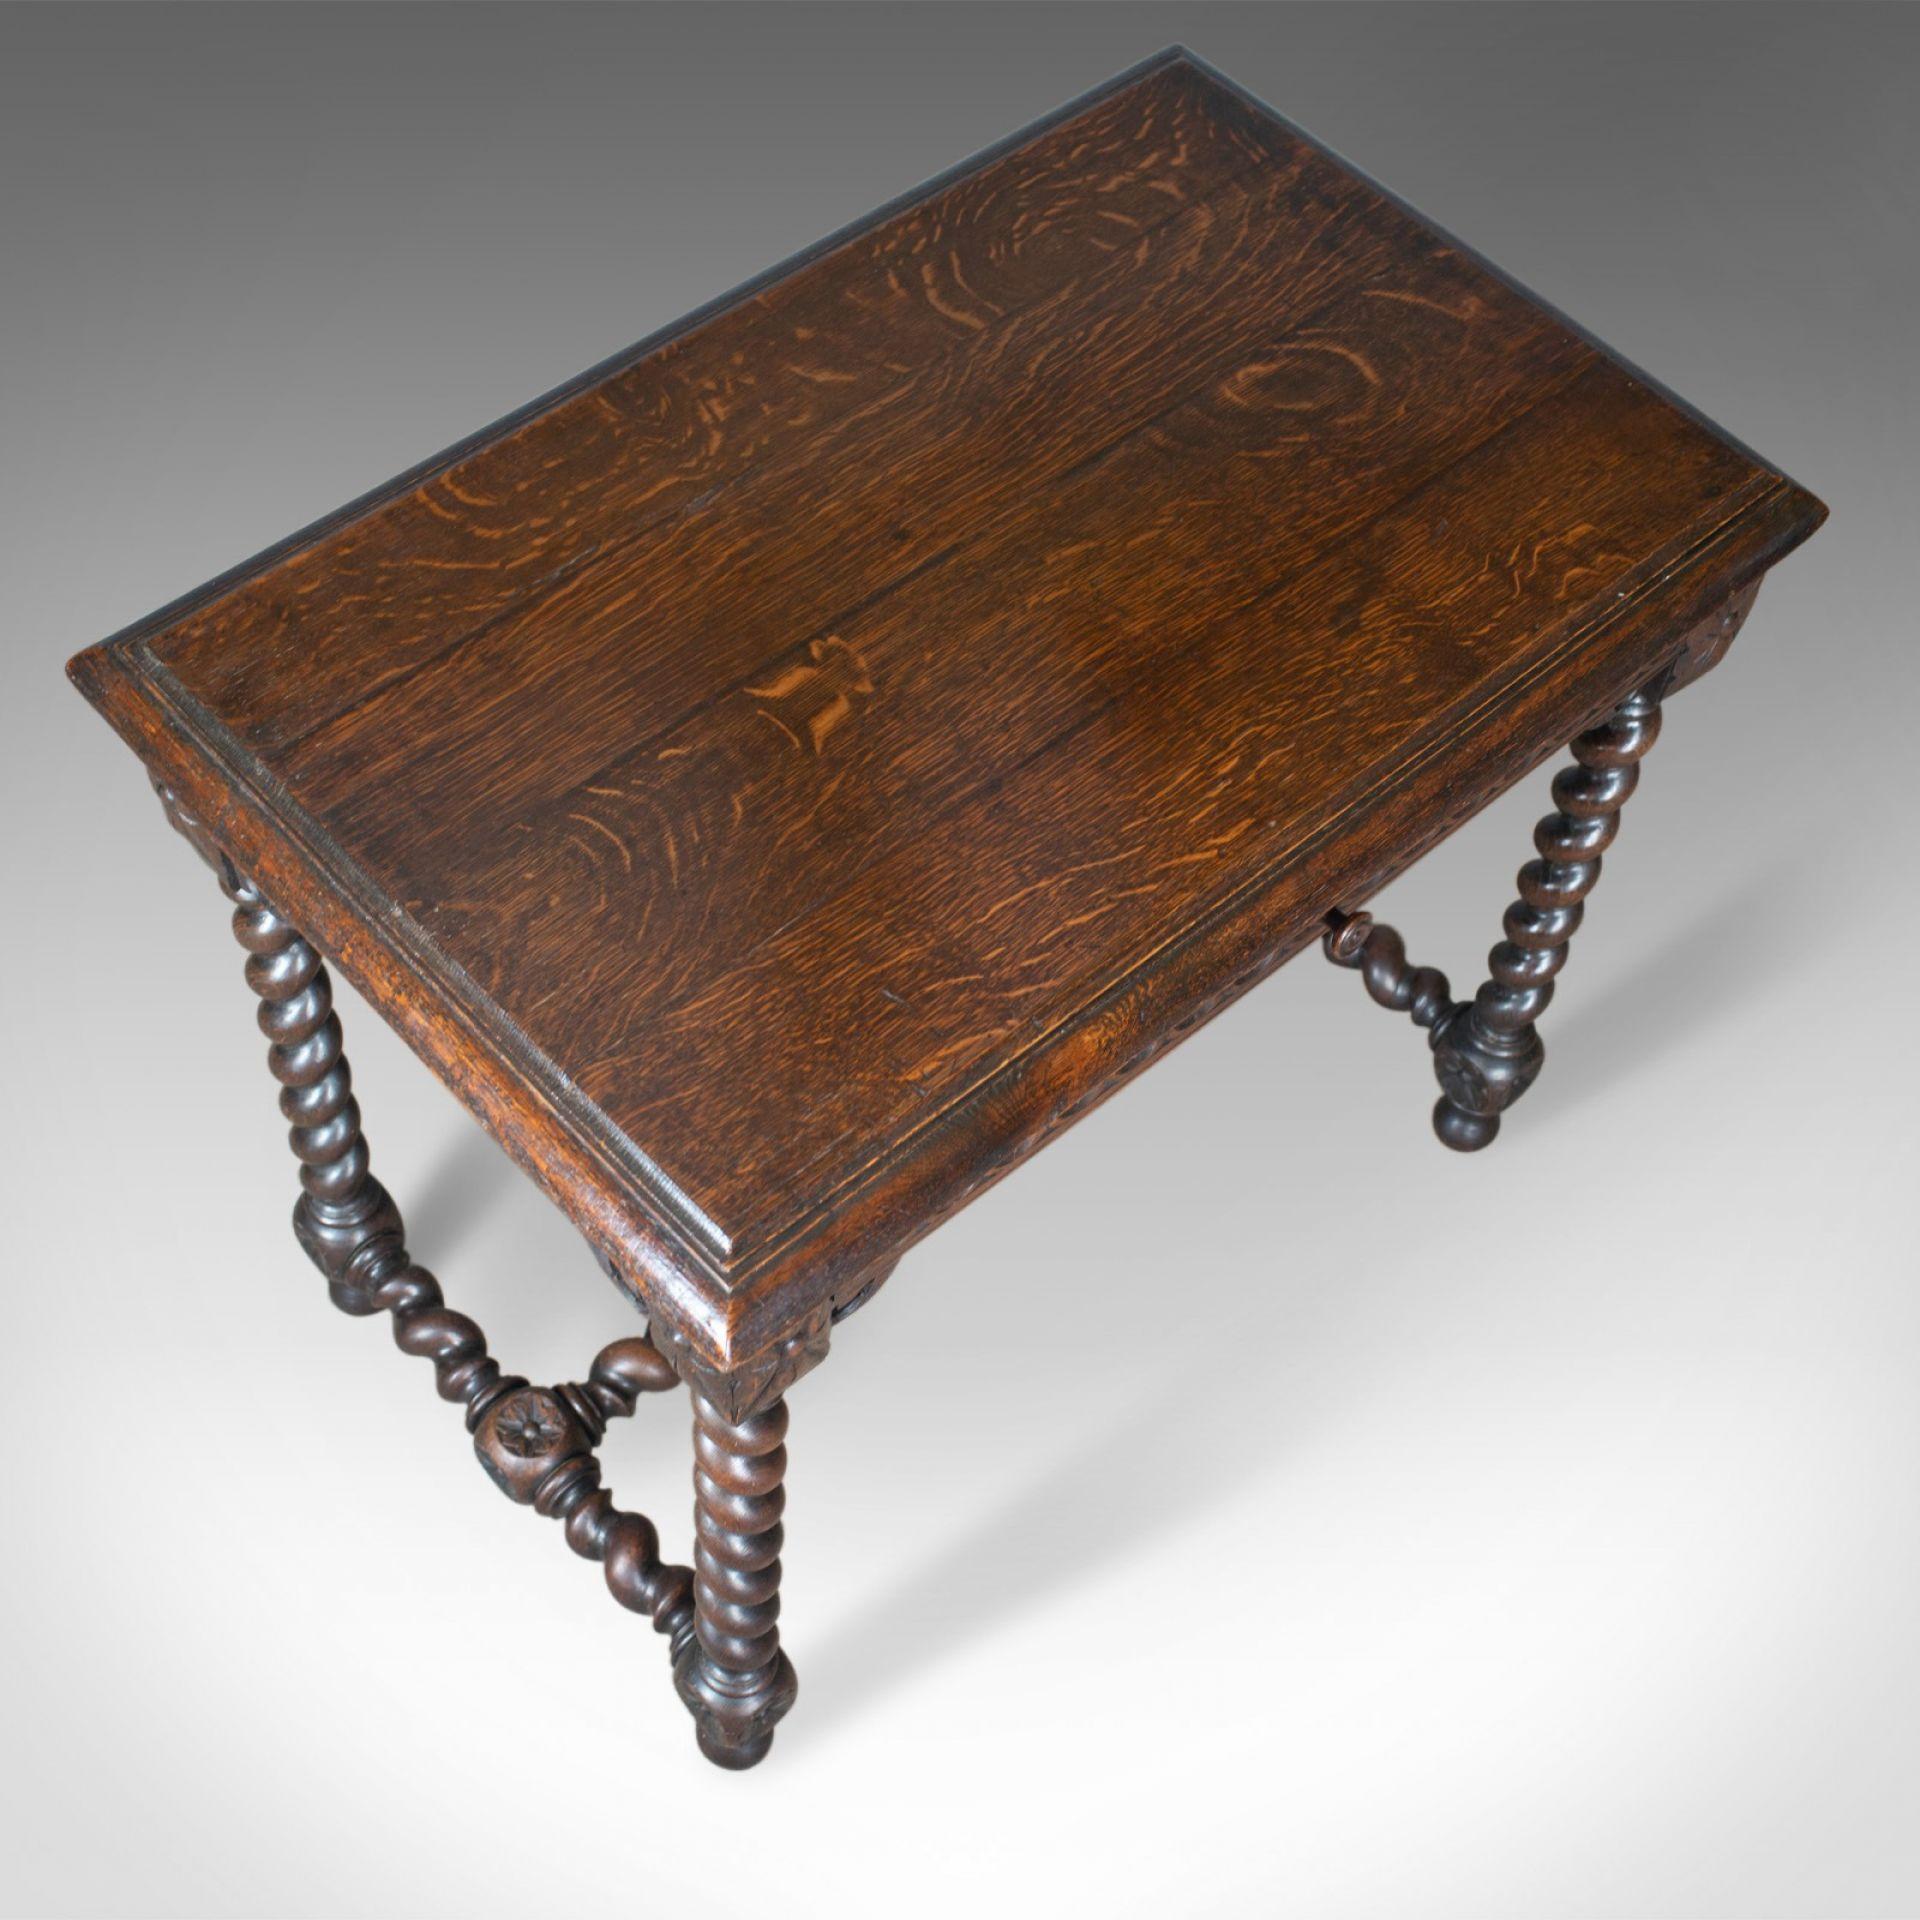 Antique Table, Scottish, Oak, Carved, Barley Twist, Side, Circa 1880